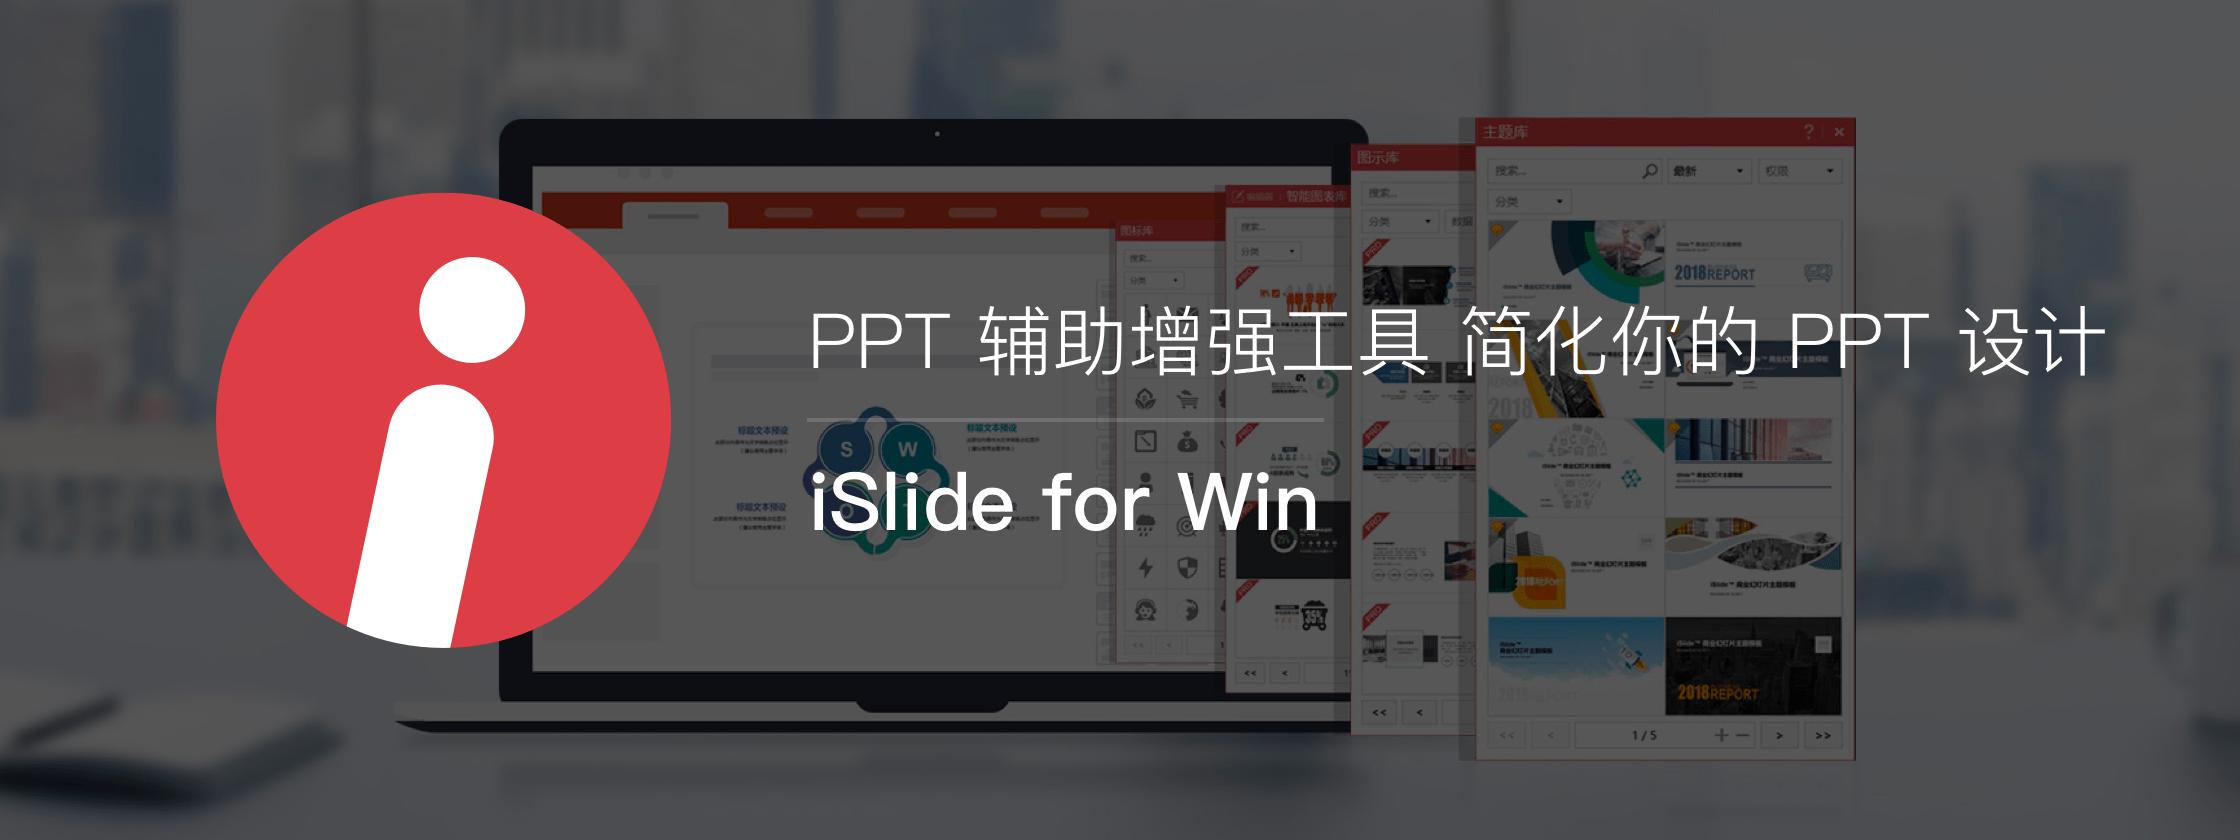 iSlide,PPT 辅助增强工具,简化你的 PPT 设计